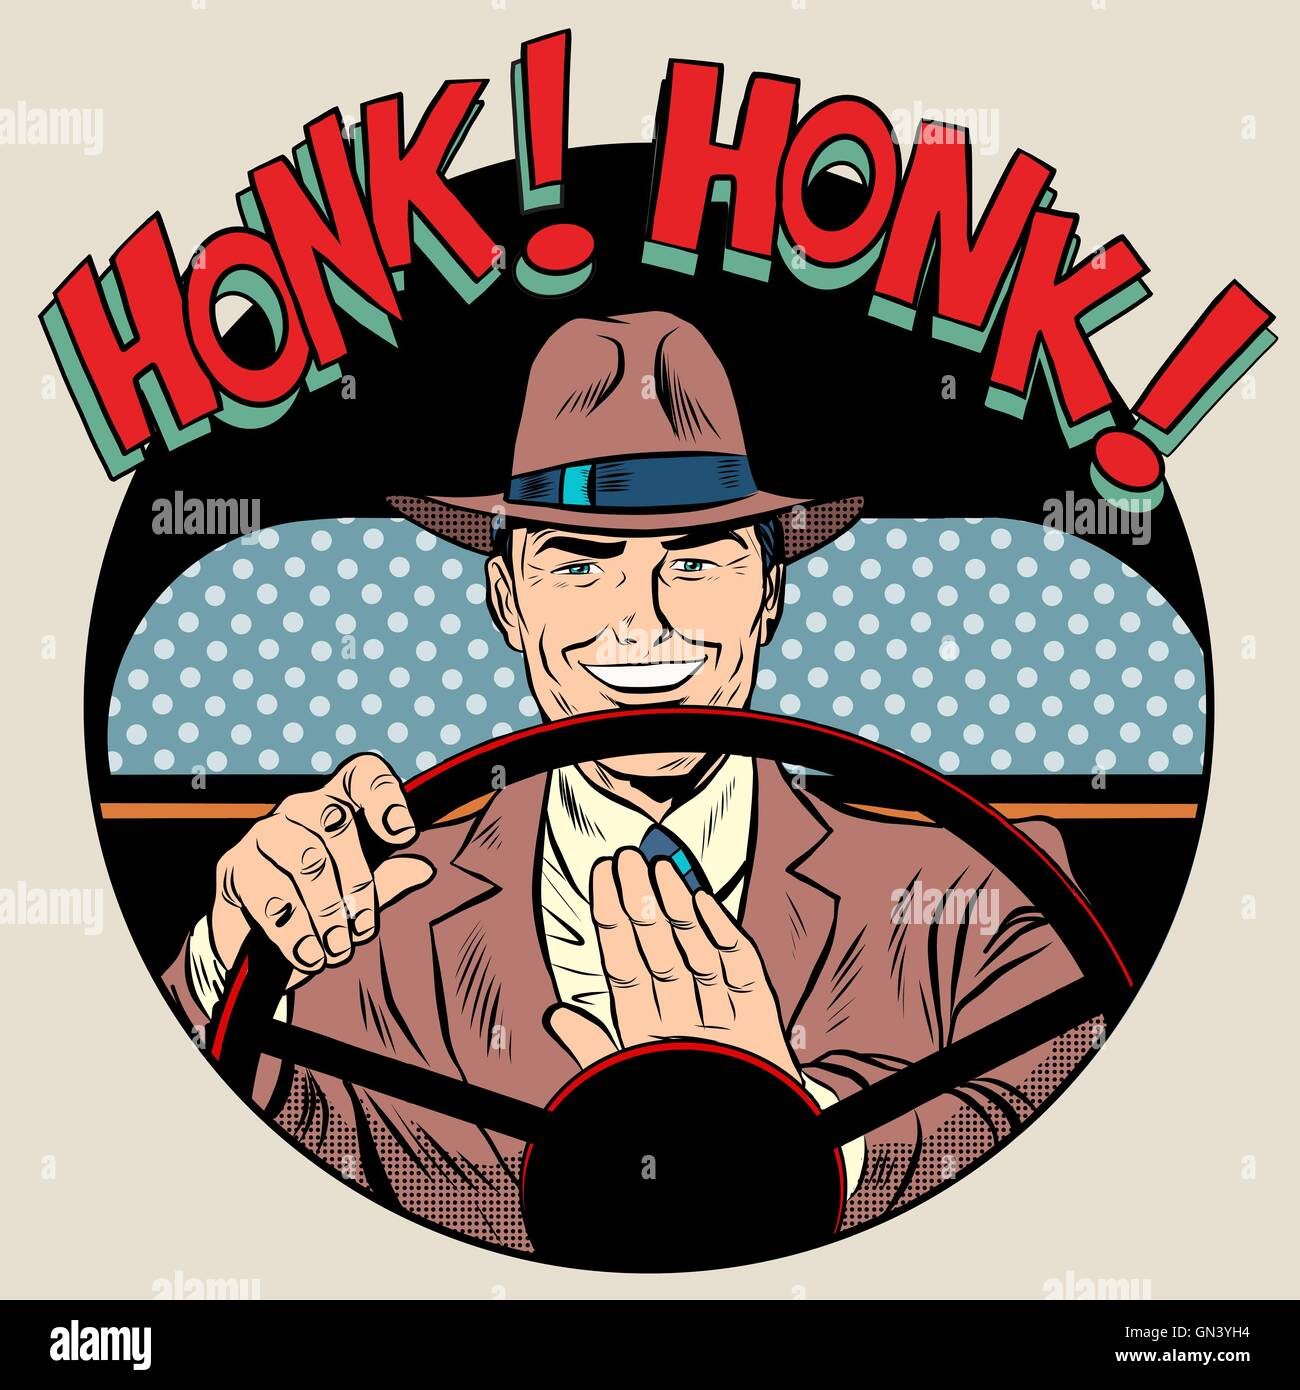 honk vehicle horn driver man - Stock Image